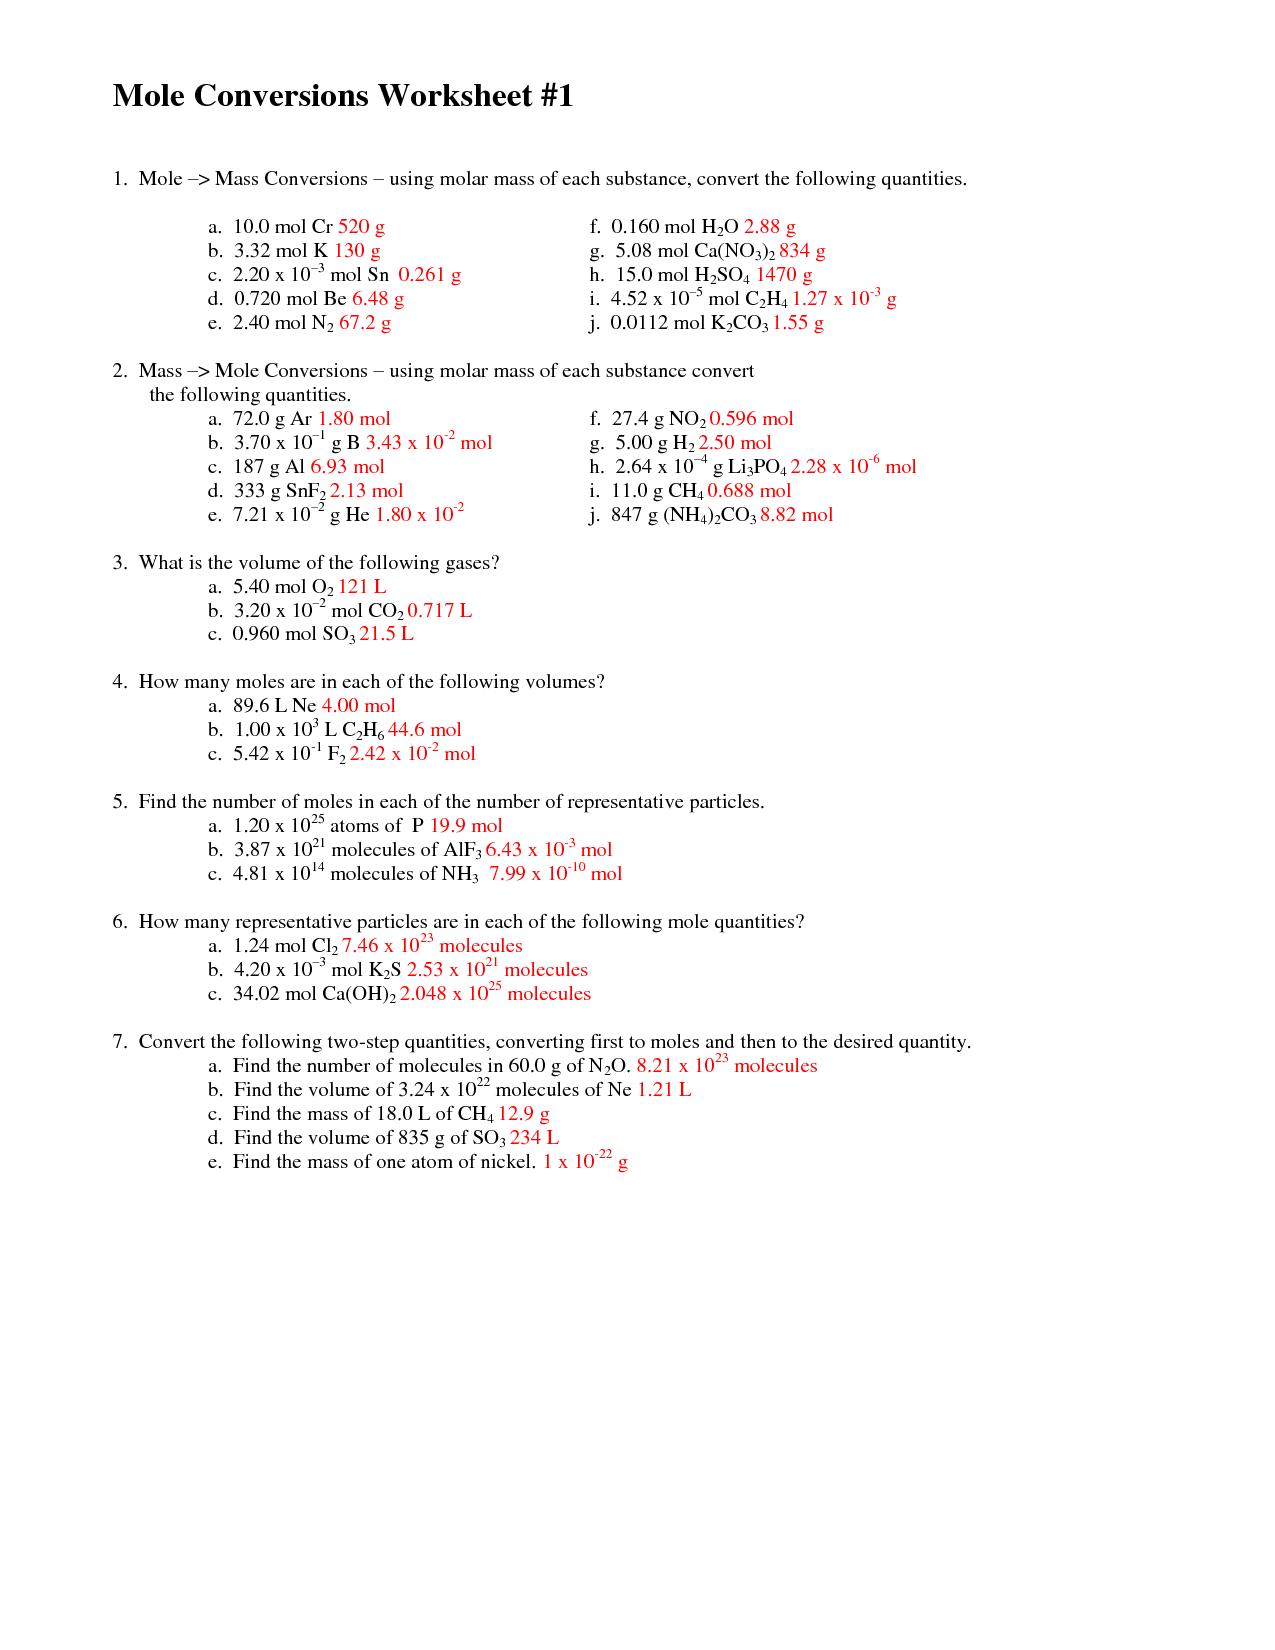 Worksheets Mole Conversion Worksheet Answers Cheatslist